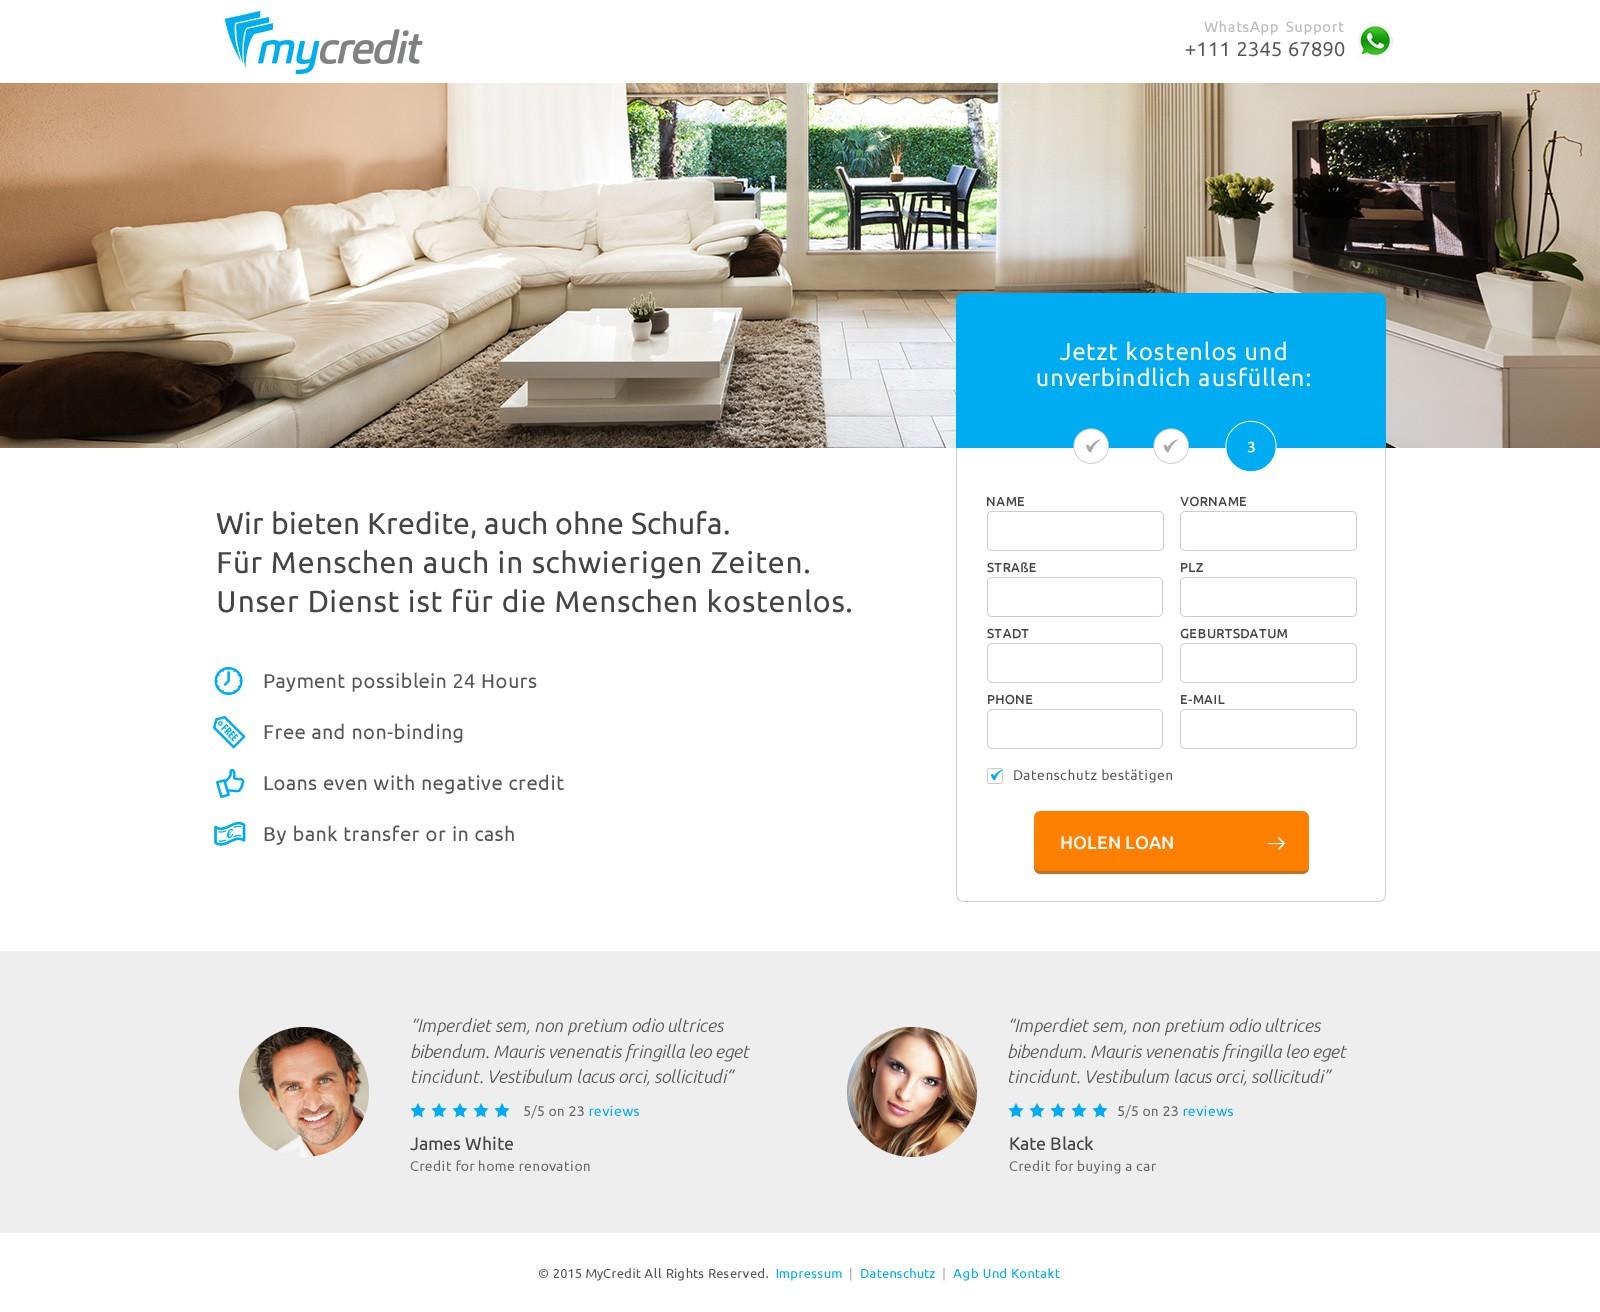 Landing Page for loans without Schufa / Landingpage für Kredite auch ohne Schufa